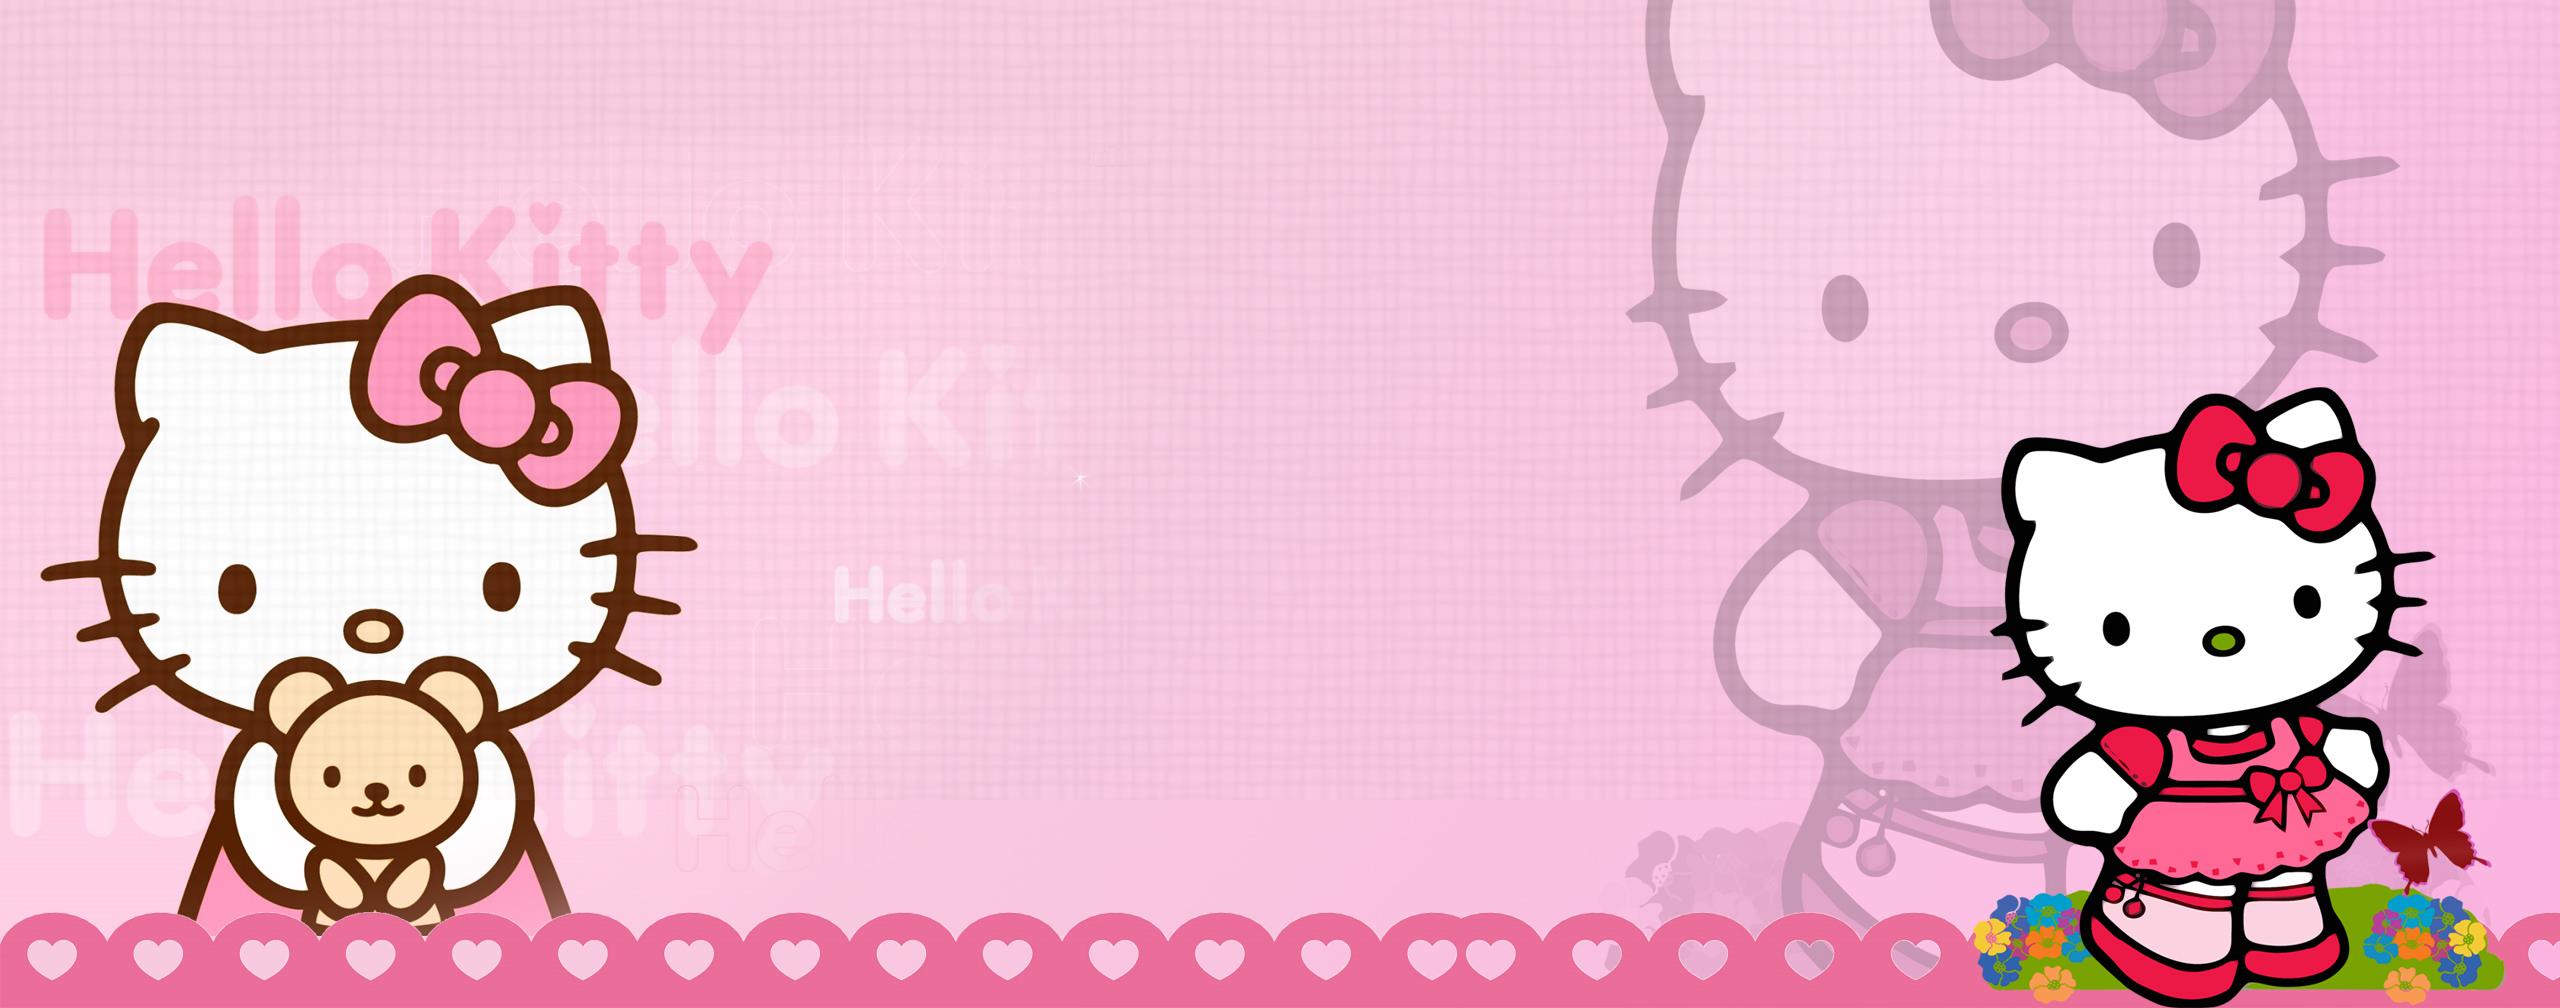 hello kitty dual monitor wallp by brh4j1